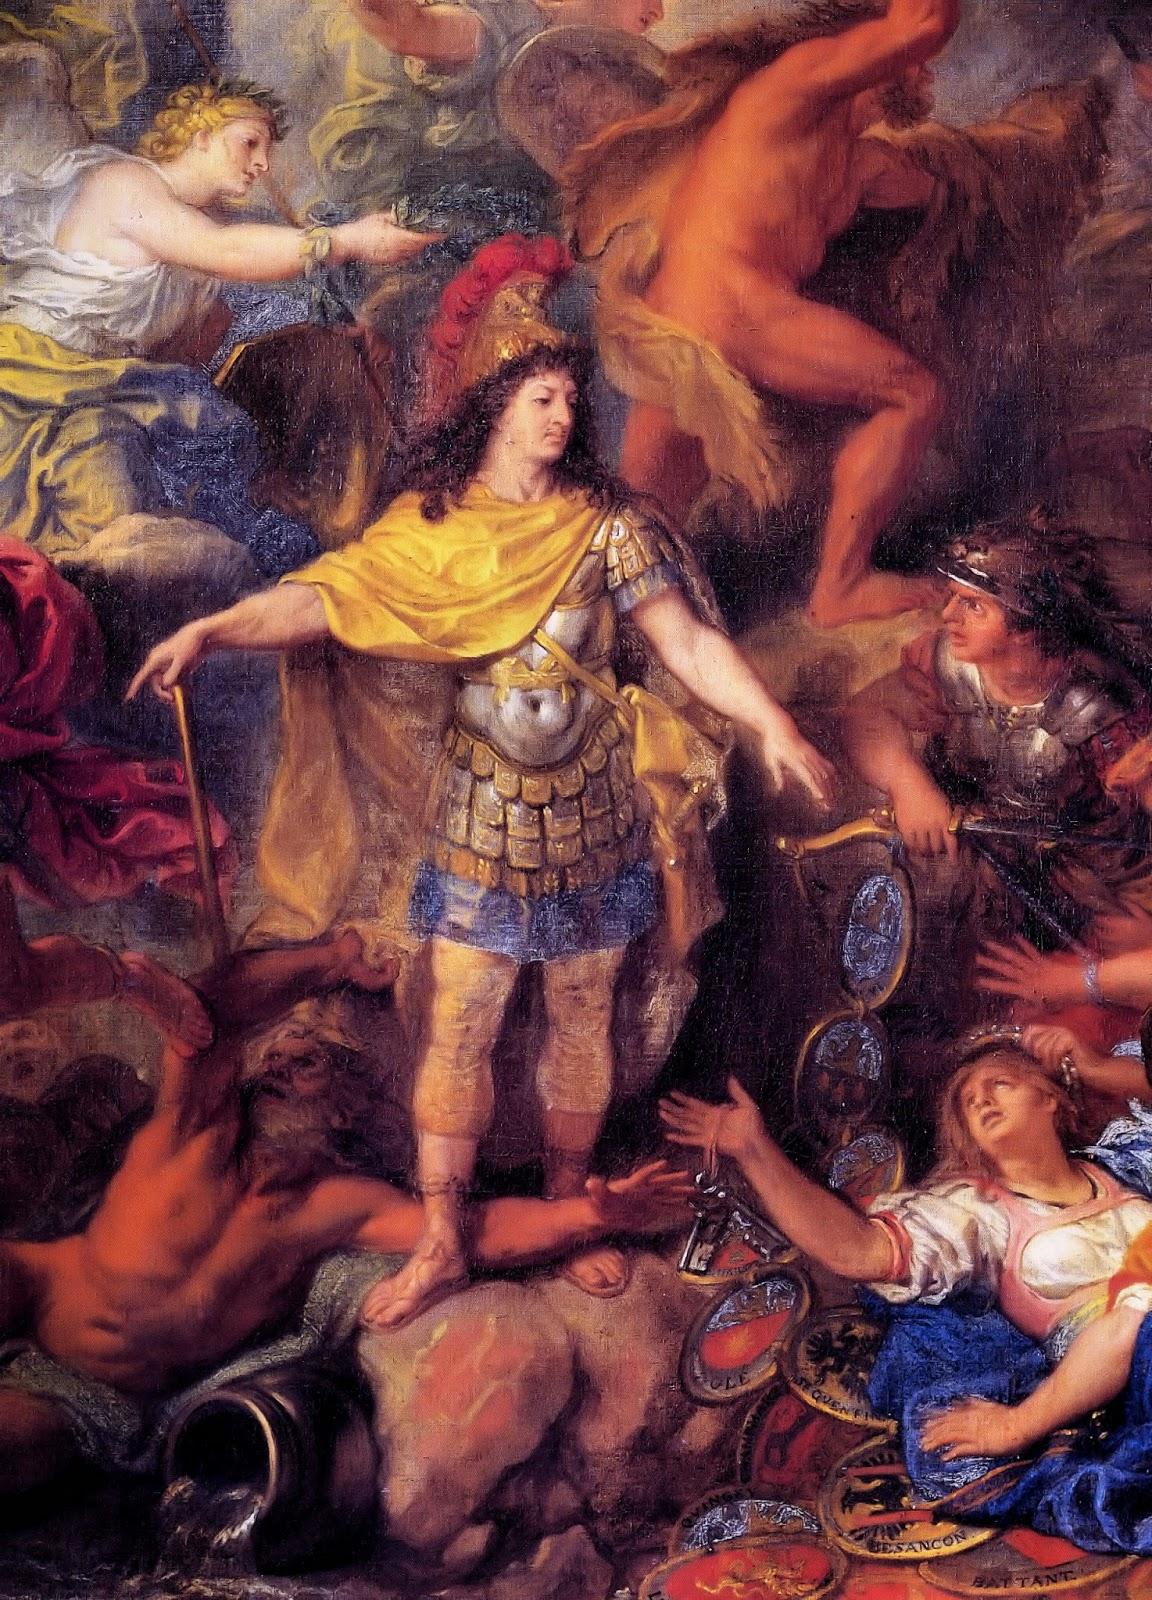 Louis_XIV_-_Charles_le_Brun